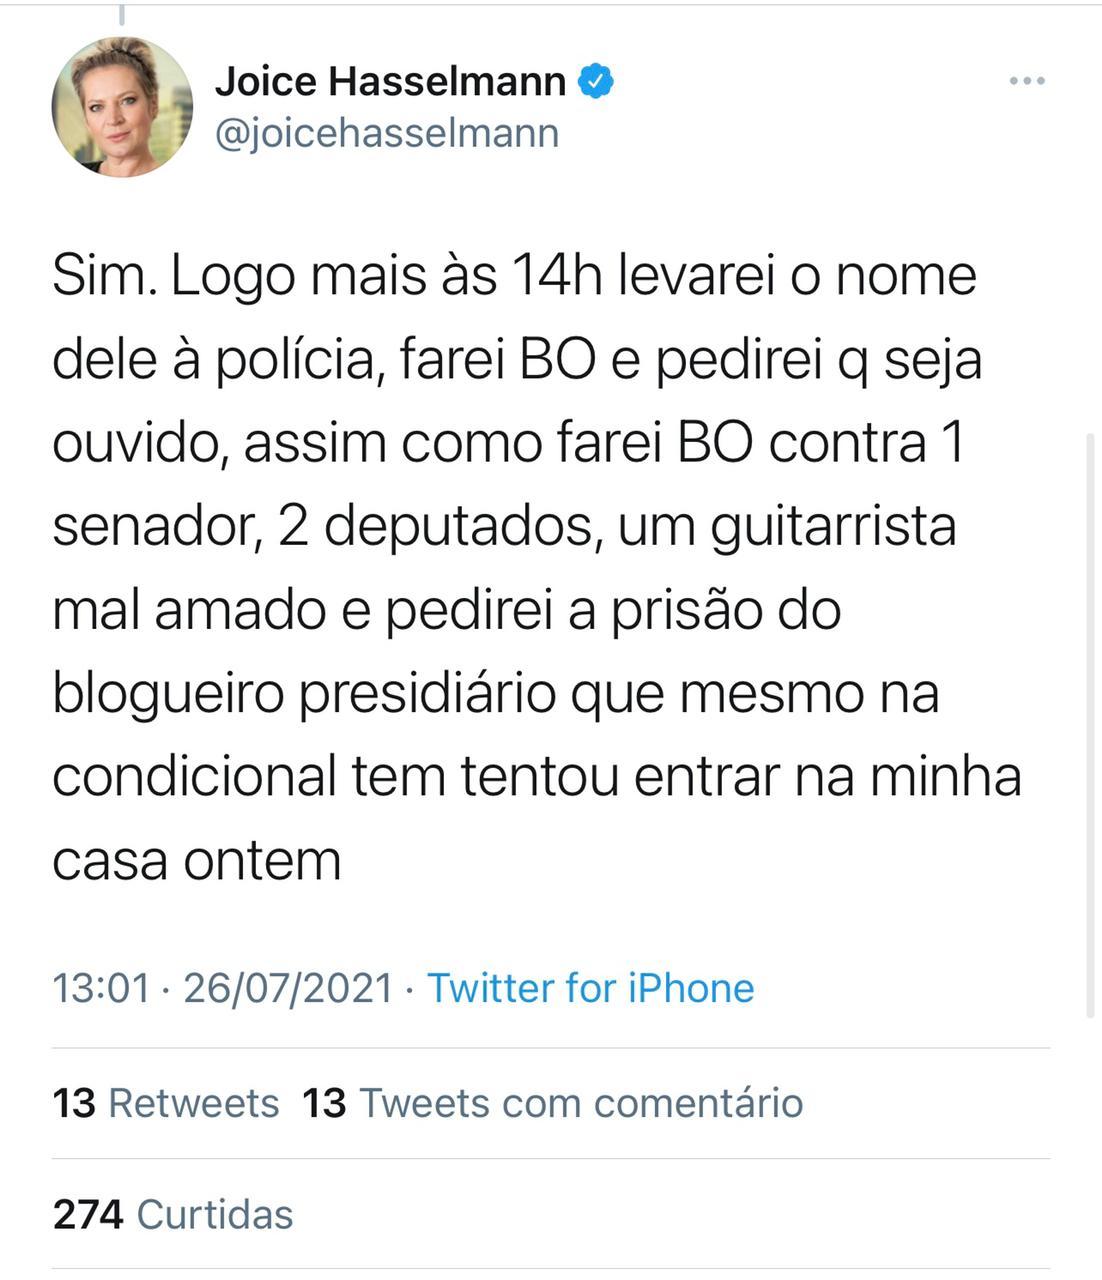 Joice Hasselmann vai fazer Boletim de Ocorrência contra o senador Styvenson Valentim